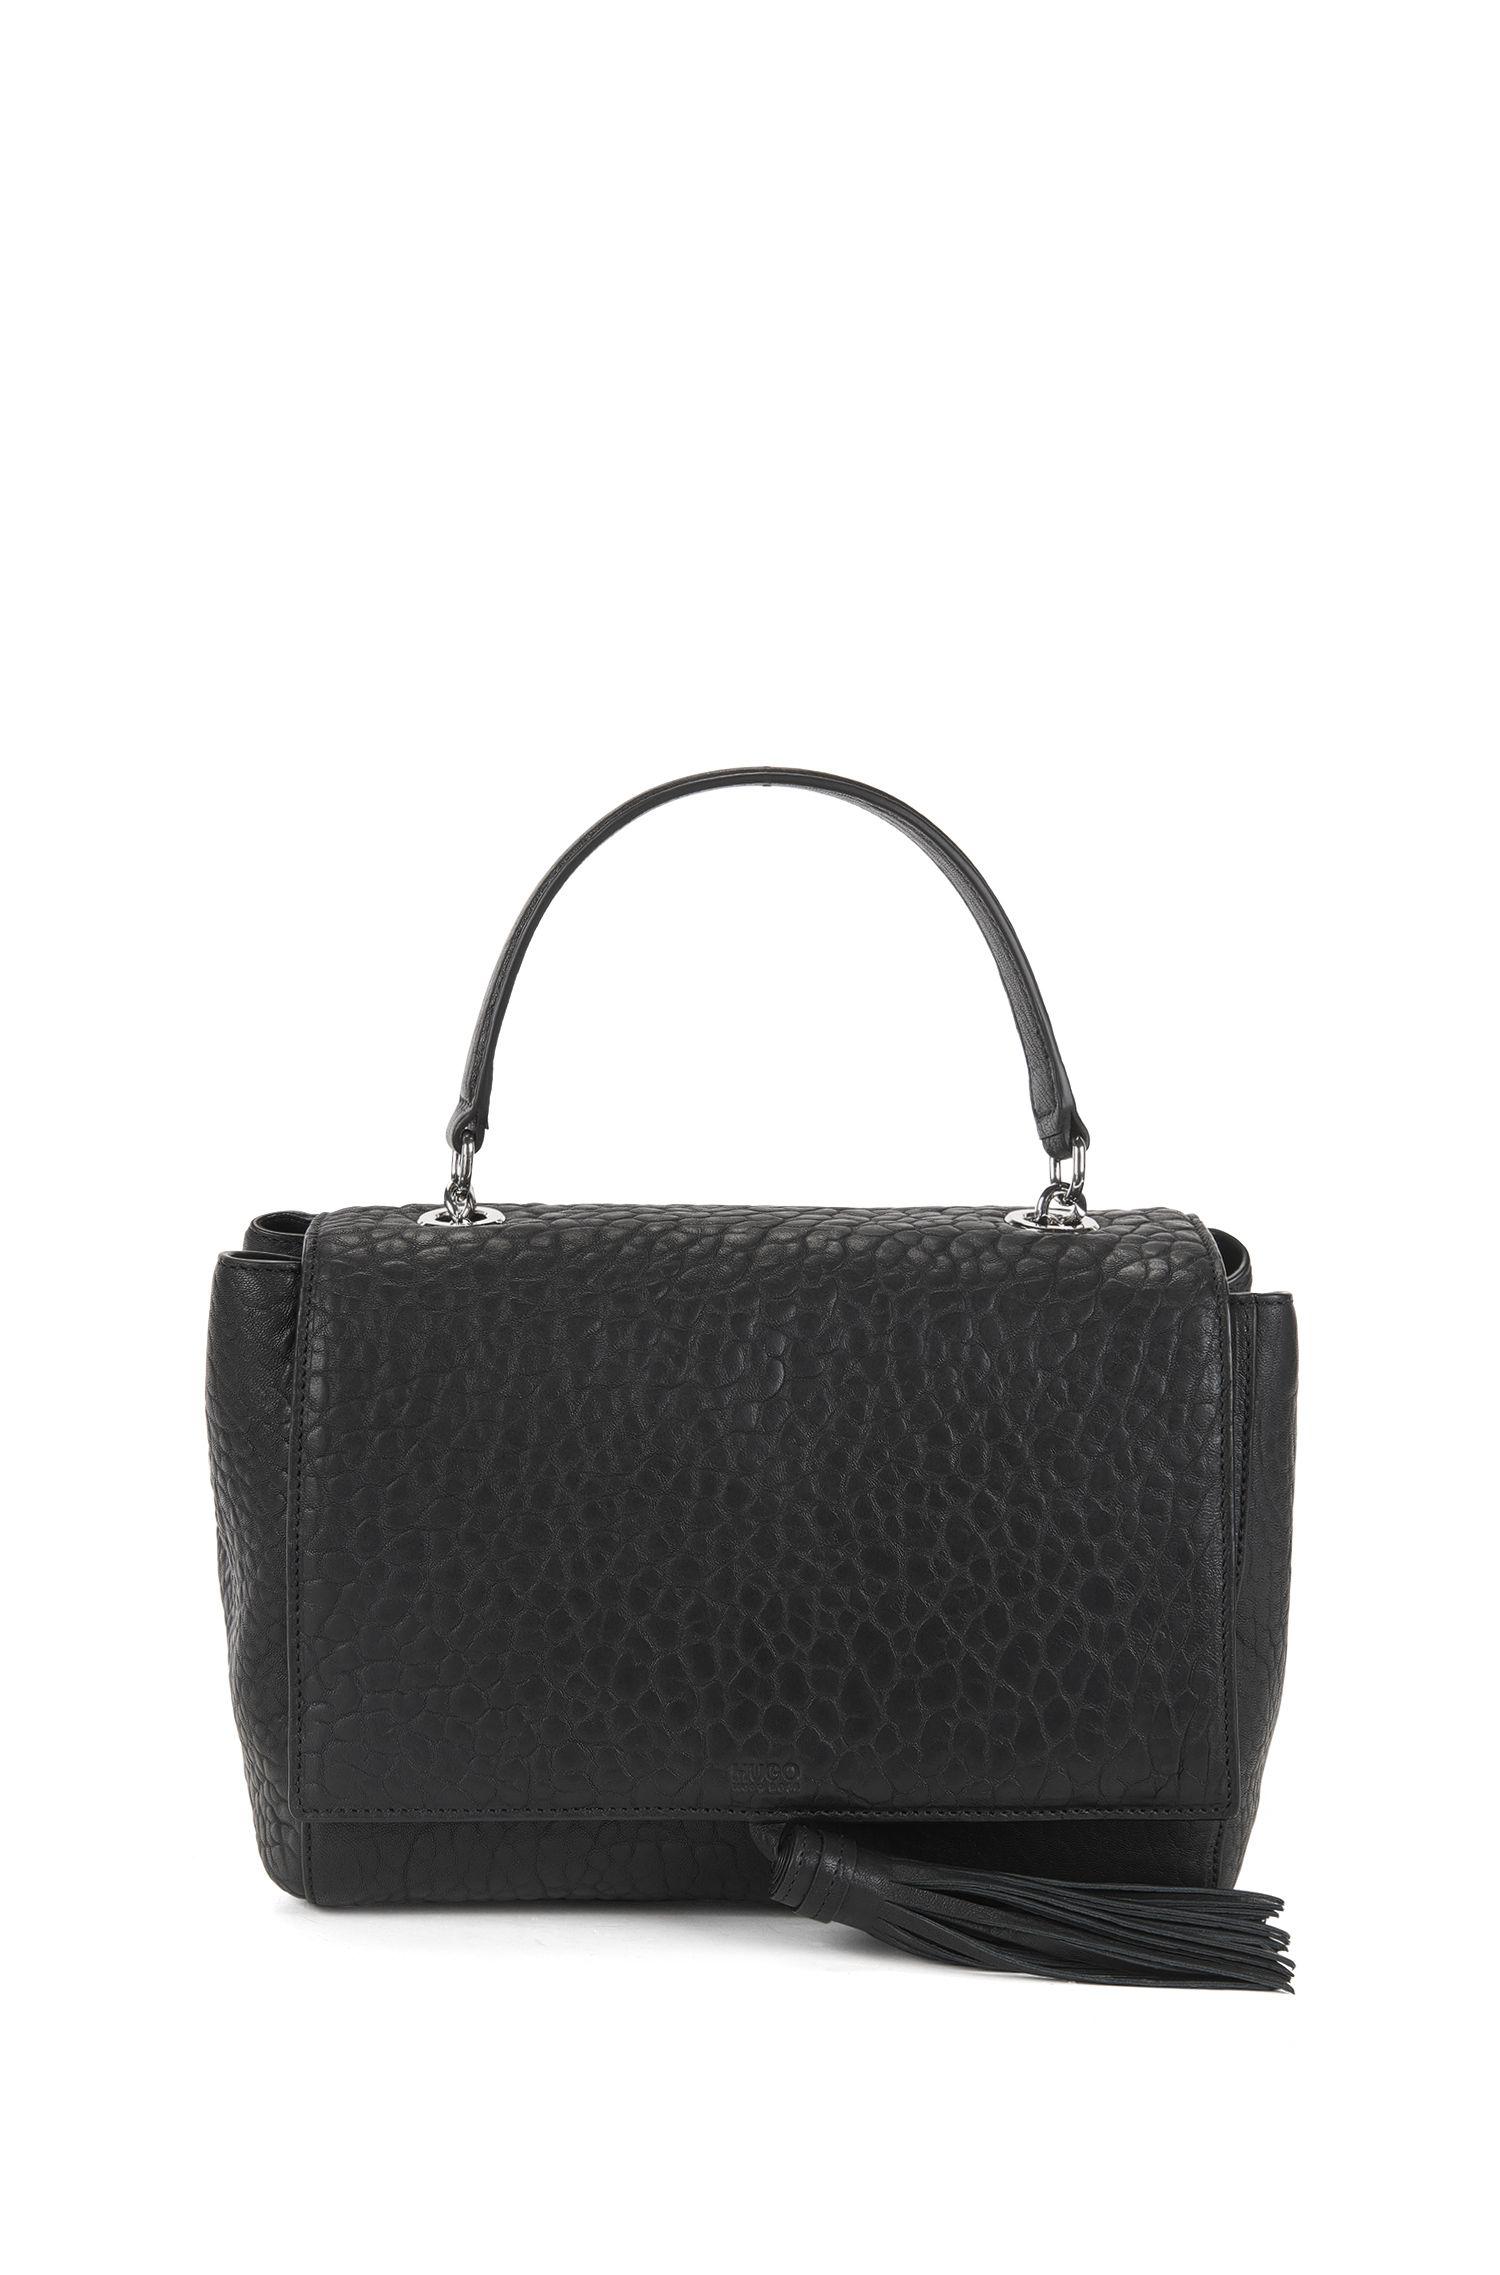 Top-handle handbag in Italian leather